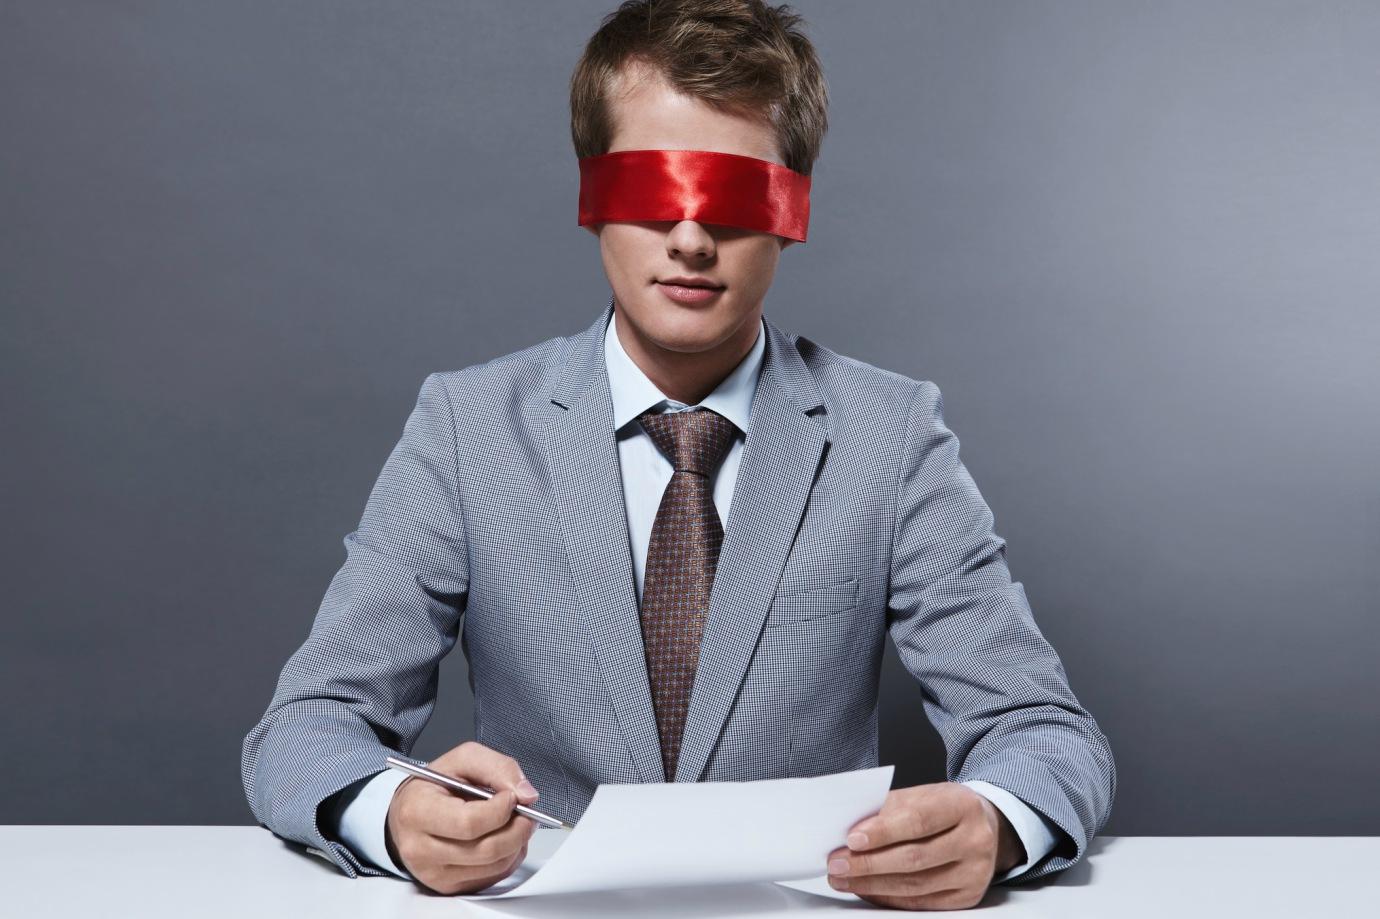 Empresas buscam evitar o preconceito na escolha de currículos